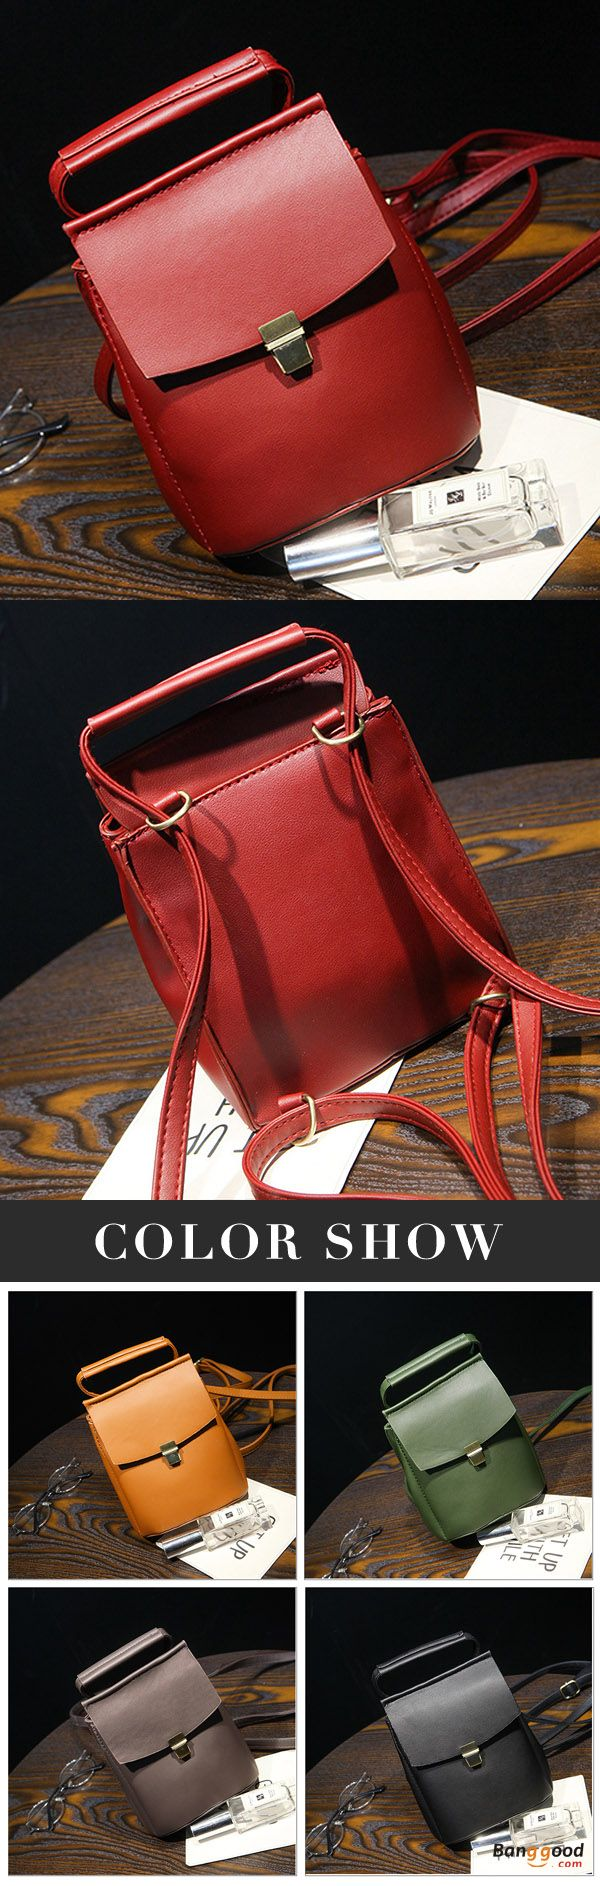 US$21.07+Free shipping. Women Bags, Mini Backpack, Handbag, Crossbody Bag, PU Leather, Retro, Elegant. Color: Black, Red, Gray, Green, Yellow Brown. Shop now~